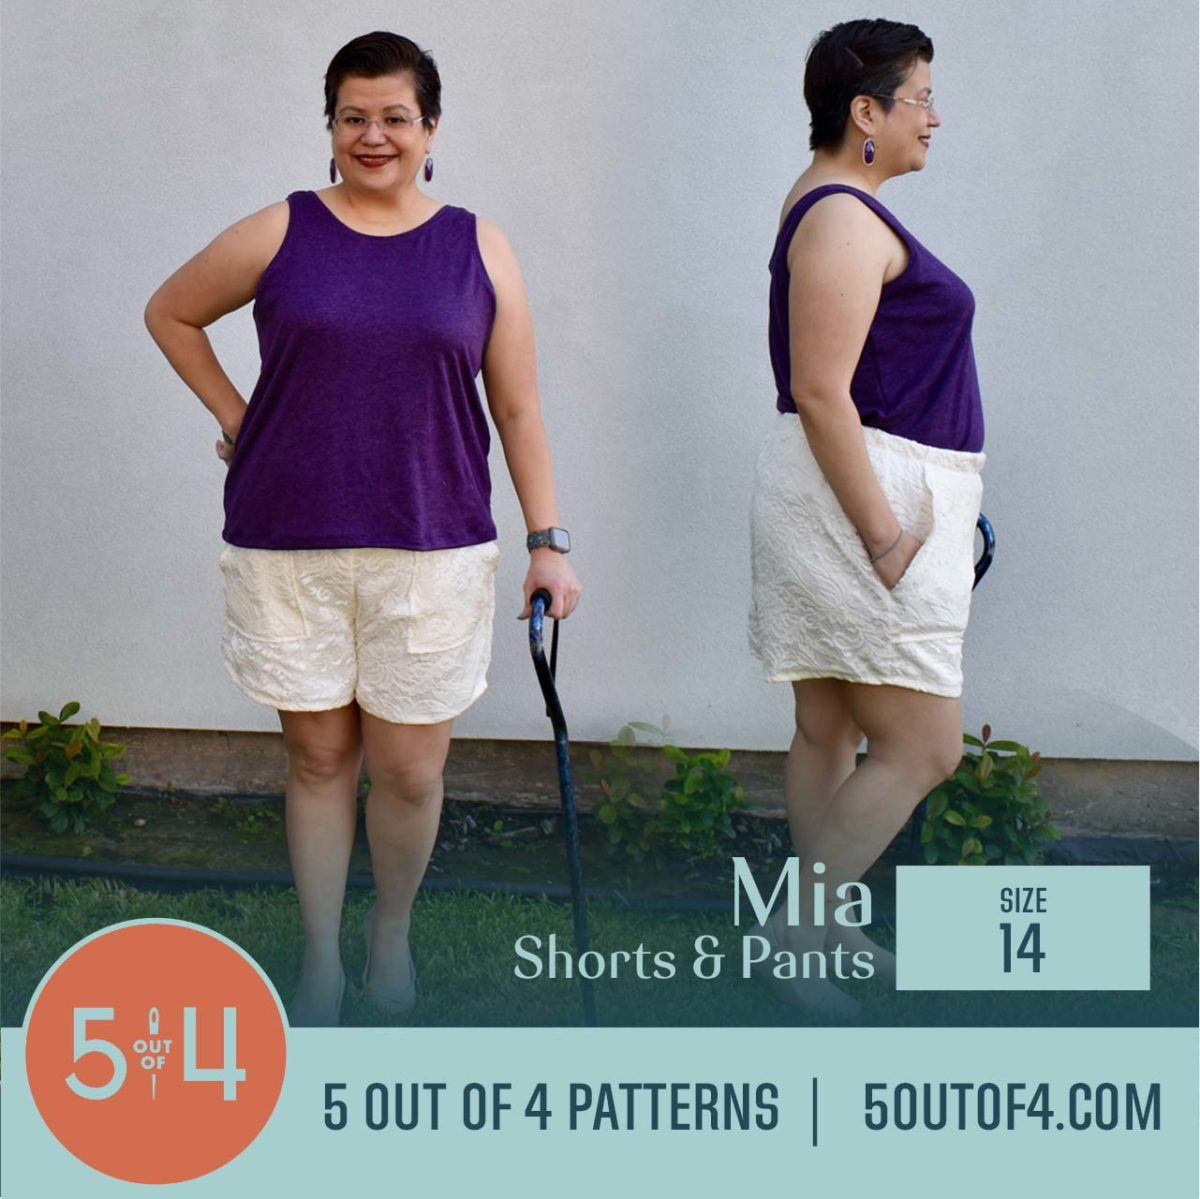 5oo4 Patterns Mia Pants size 14